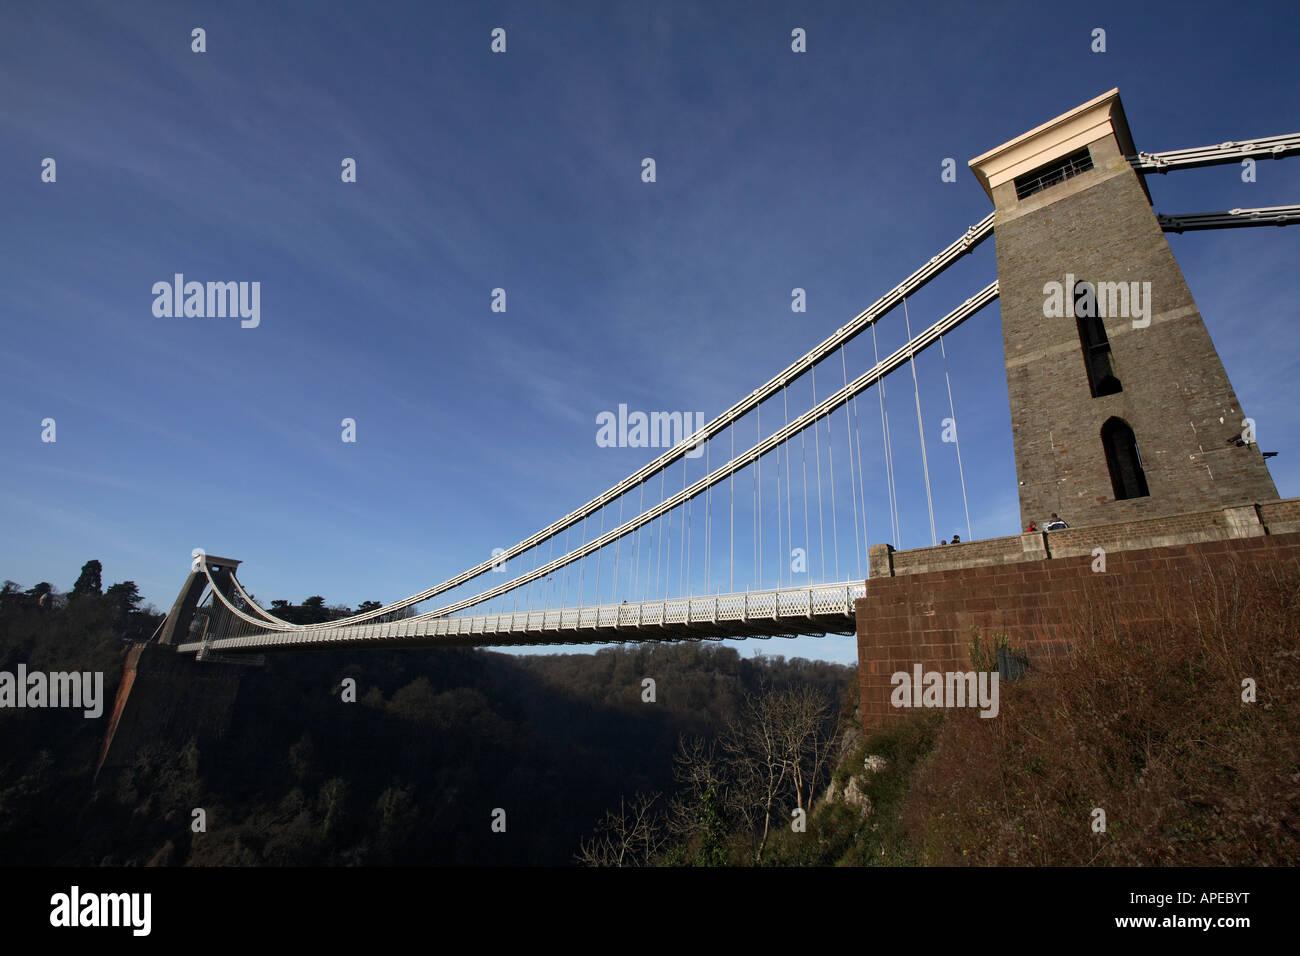 Isambard Kingdom Brunel's Clifton Suspension Bridge spanning the Avon Gorge. Bristol. Somerset. England. UK. - Stock Image